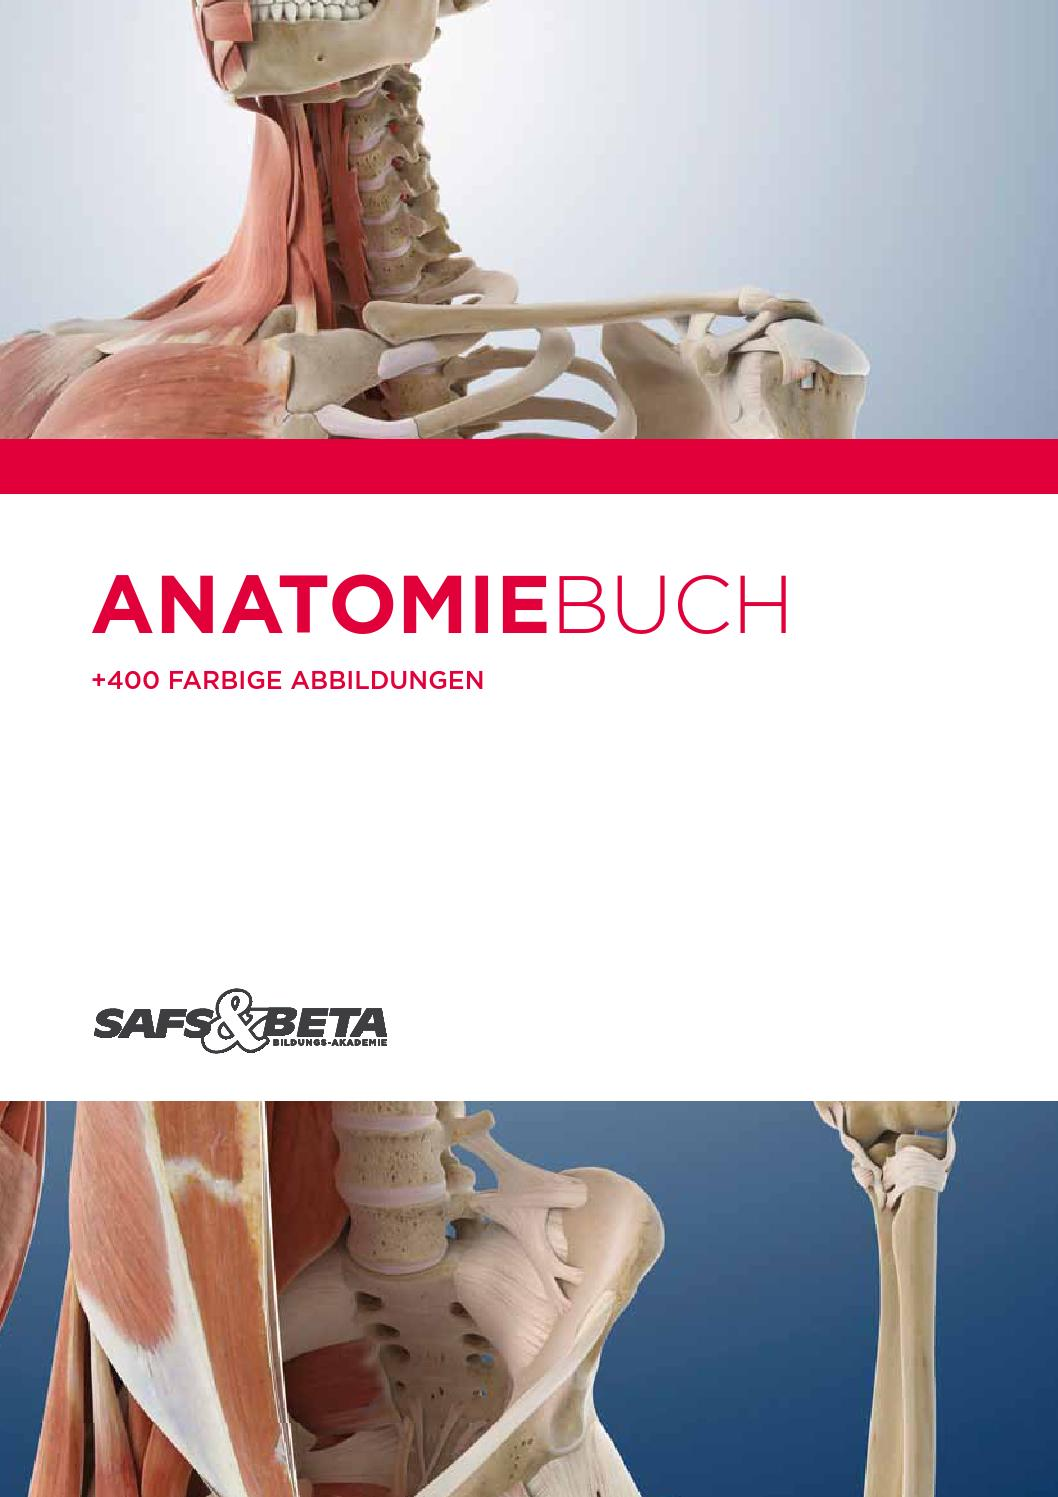 Fein Längster Muskel In Körper Ideen - Anatomie Ideen - finotti.info